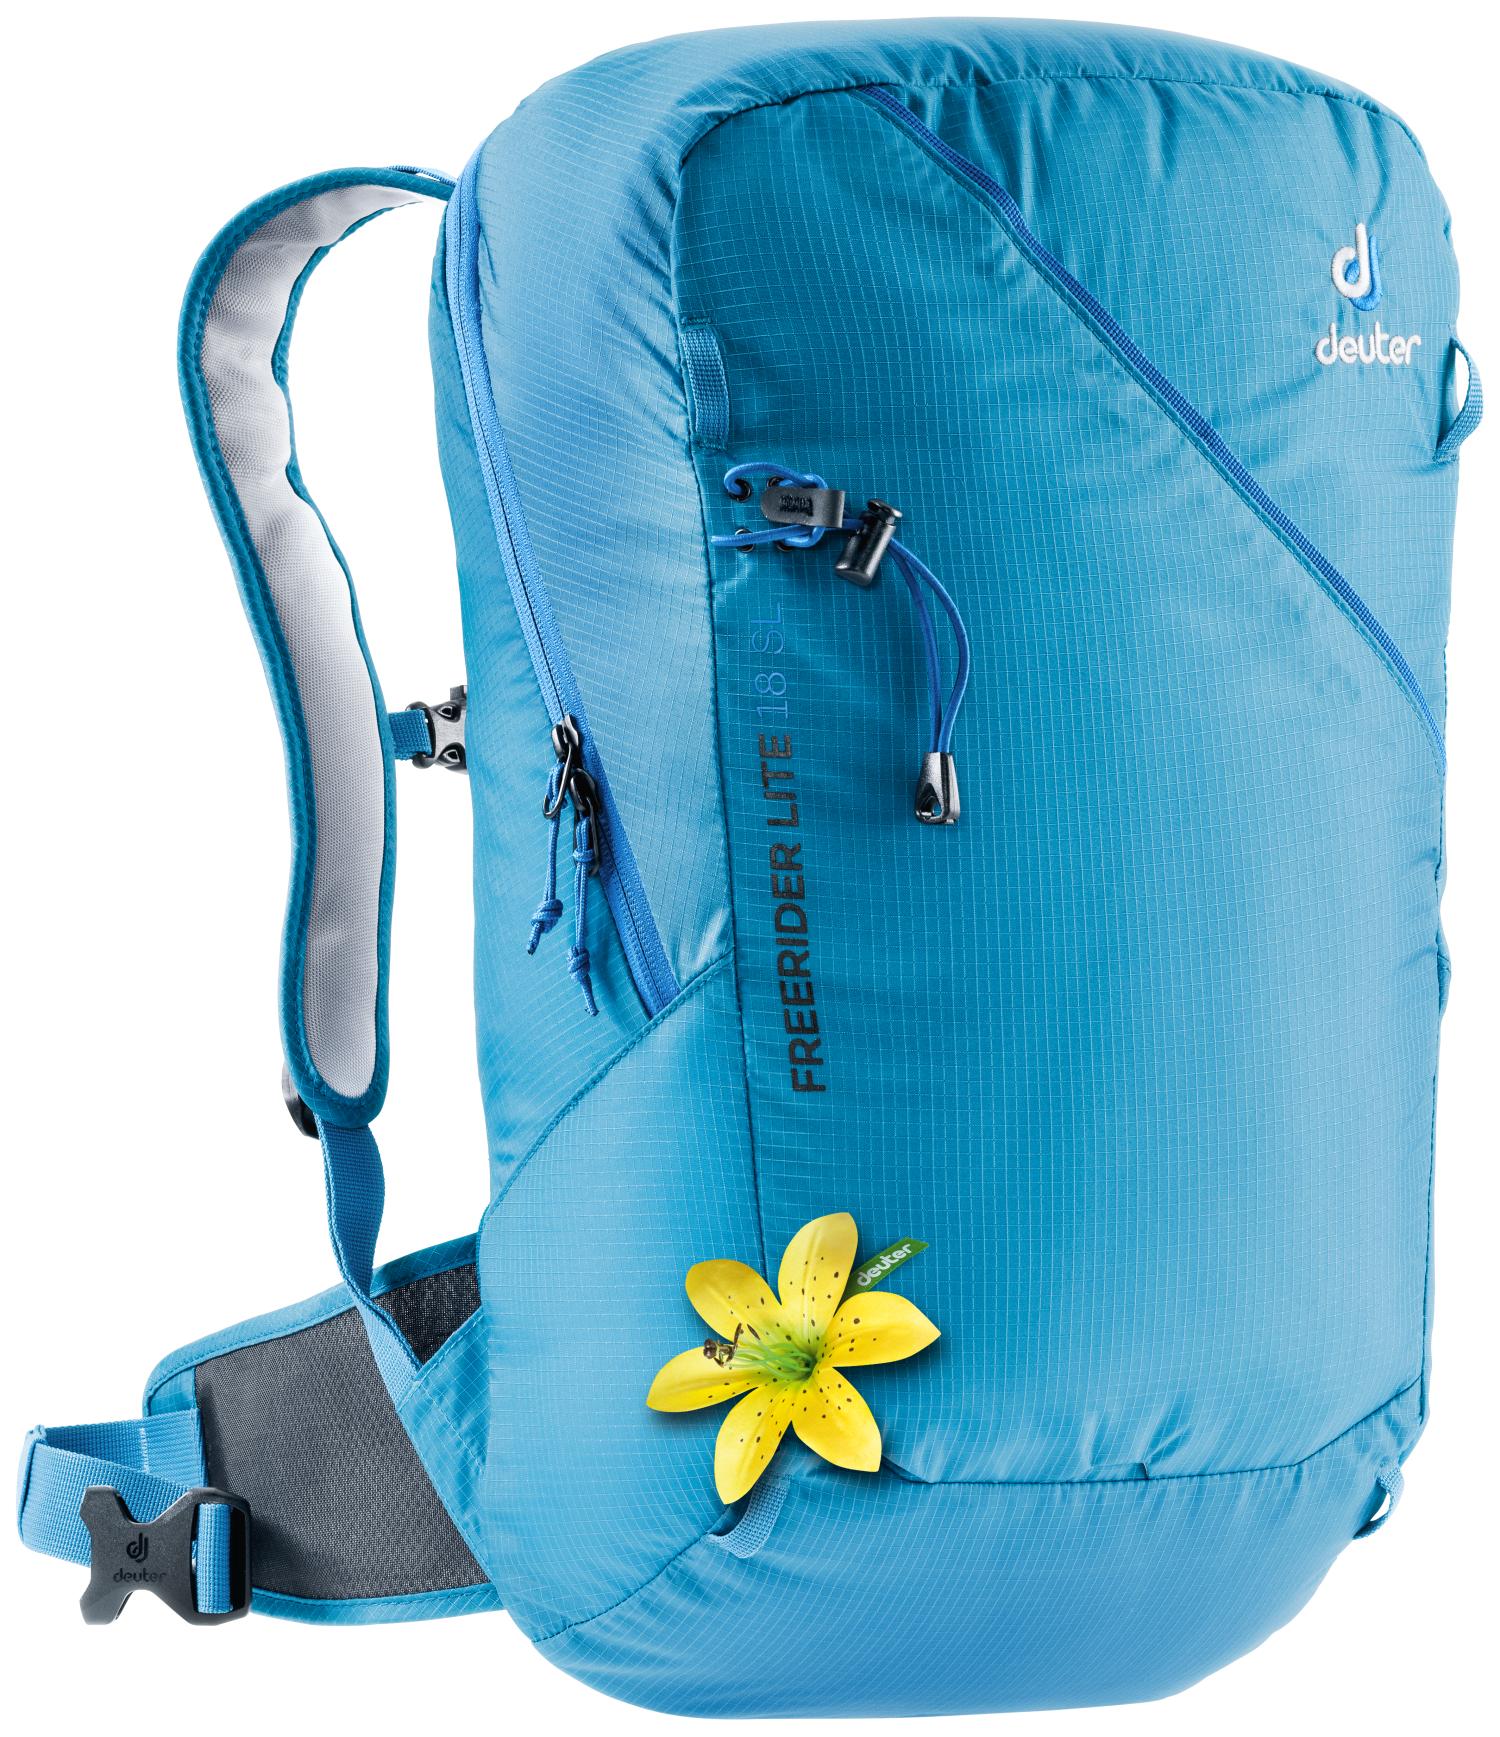 Рюкзаки для фрирайда Рюкзак сноубордический Deuter Freerider Lite 18 SL 3303021-3065-FreeriderLite18SL-w20-d0.jpg